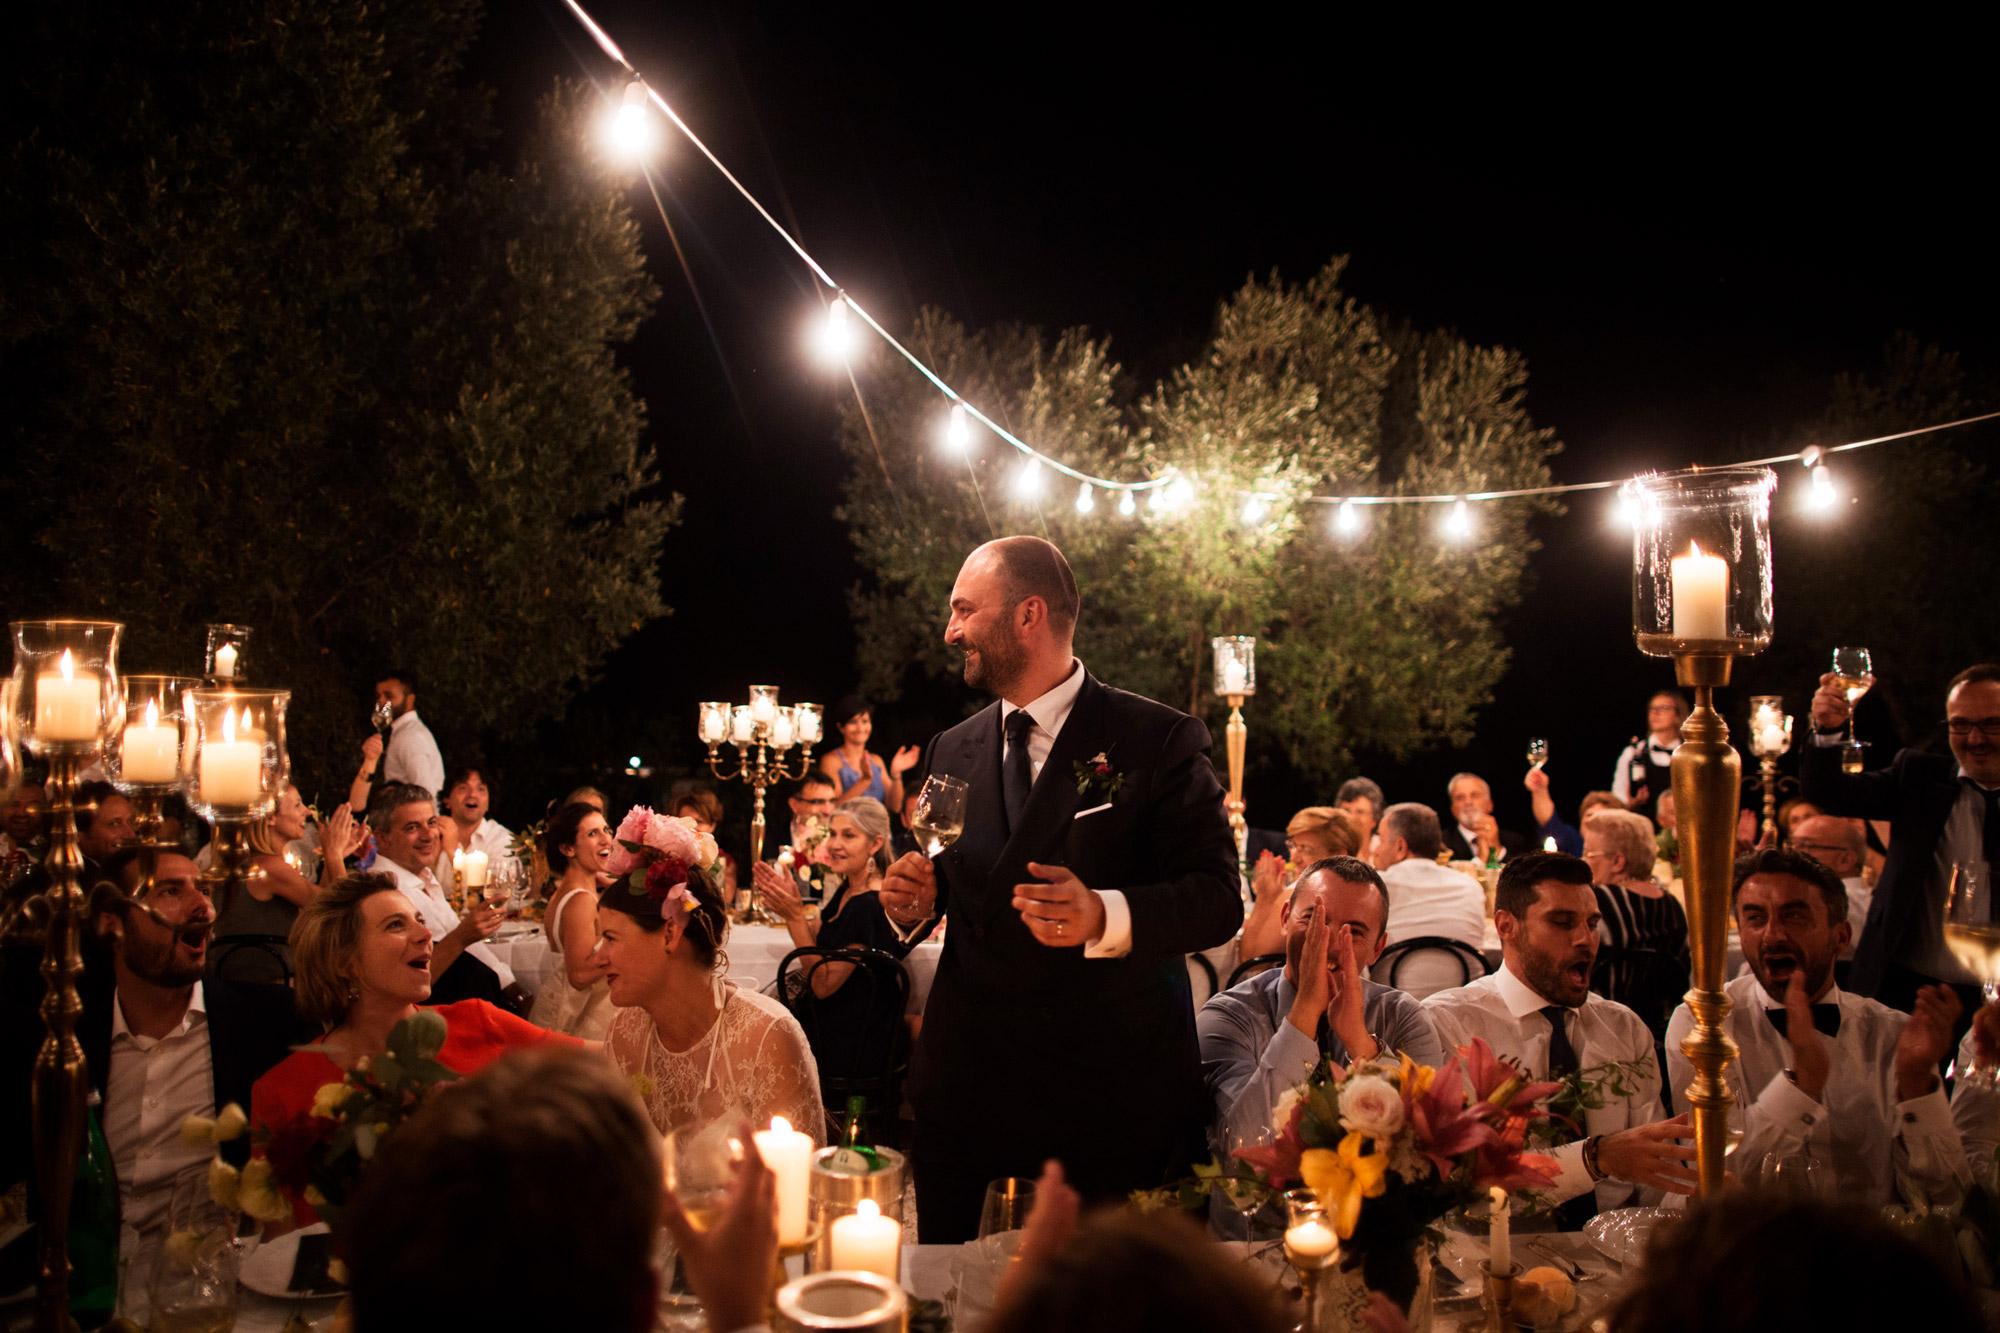 249-FIKUS-PUGLIA-wedding-ostuni-masseria.jpg